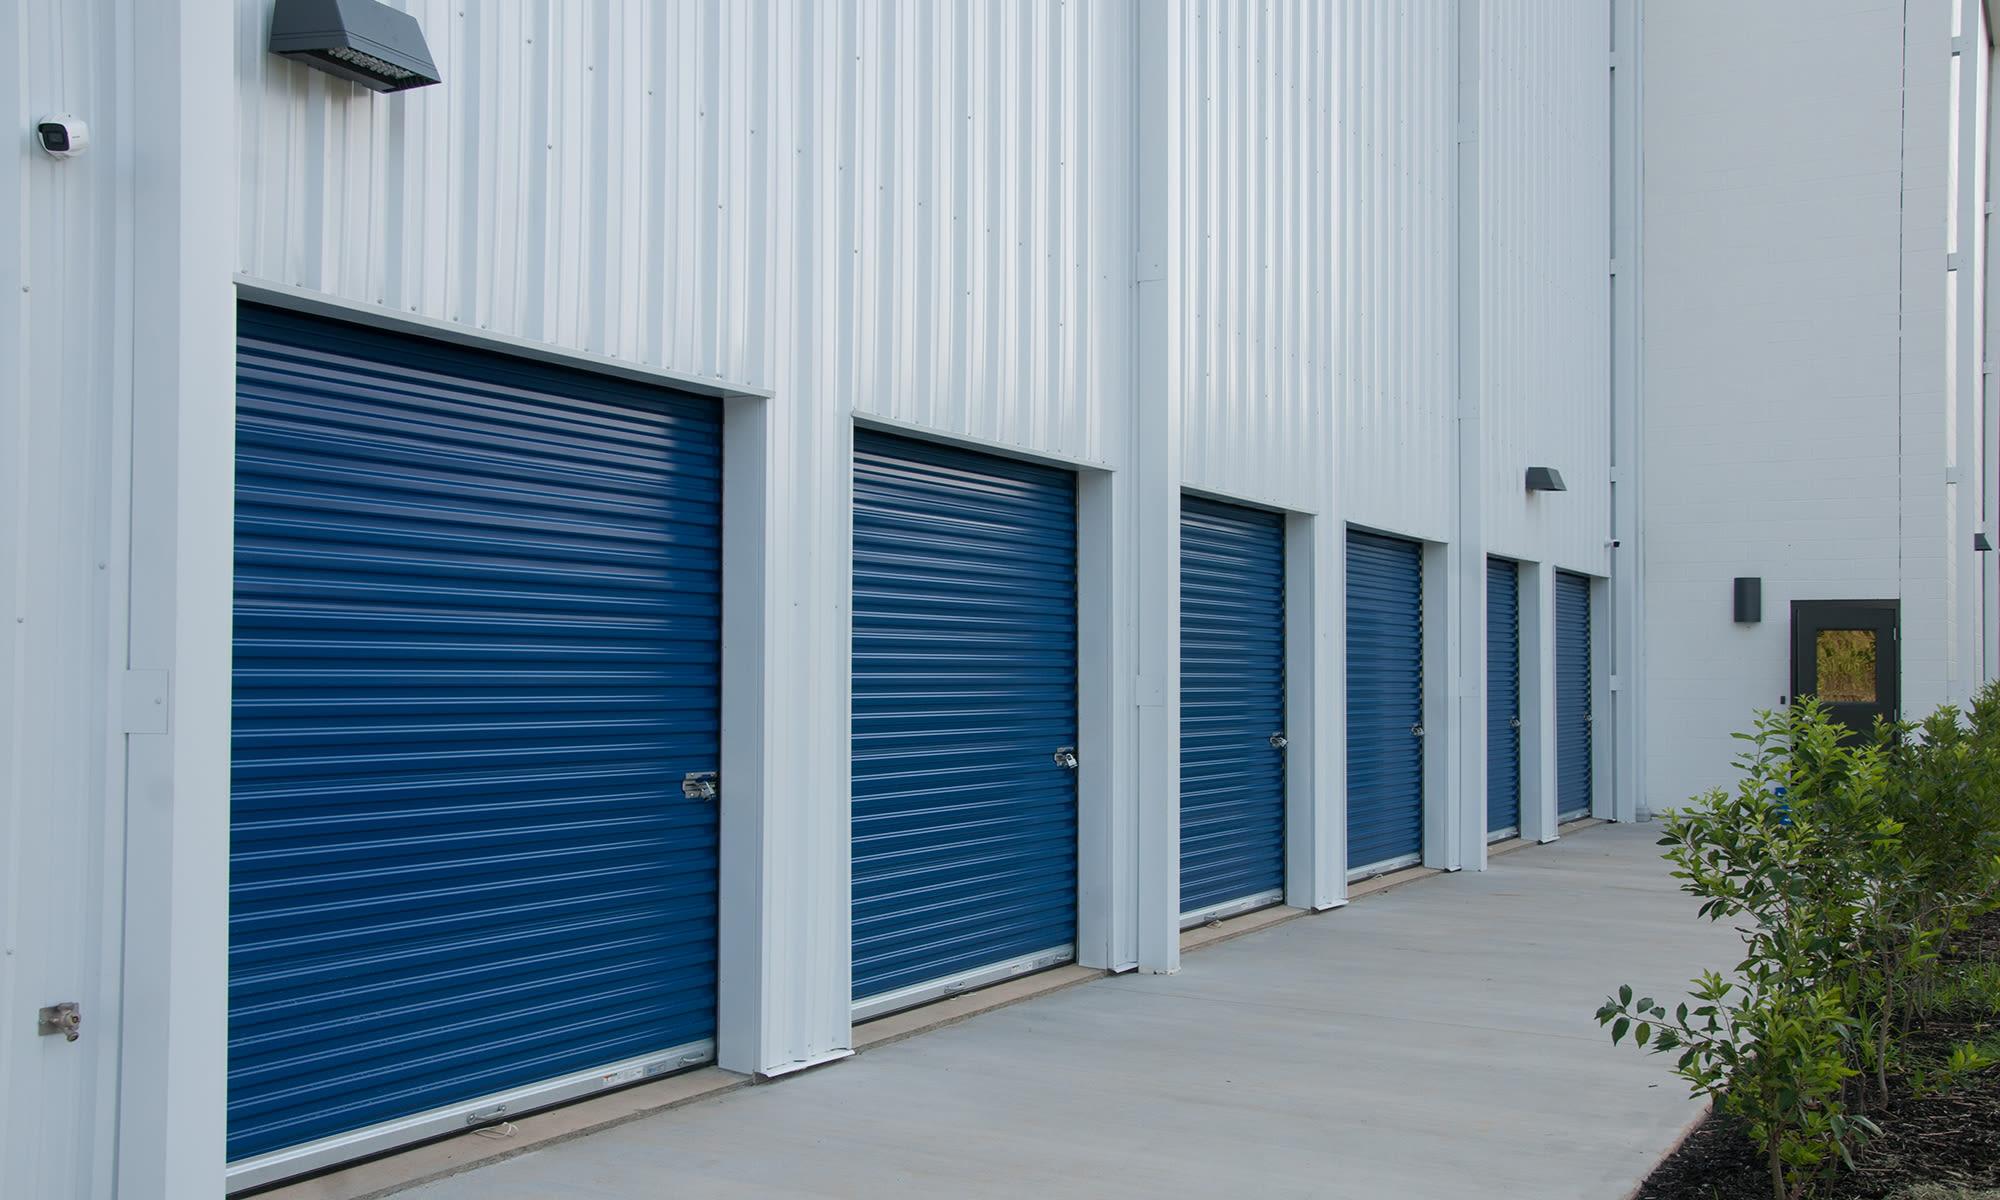 Exterior Units at Virginia Varsity Self Storage in Roanoke, Virginia is located